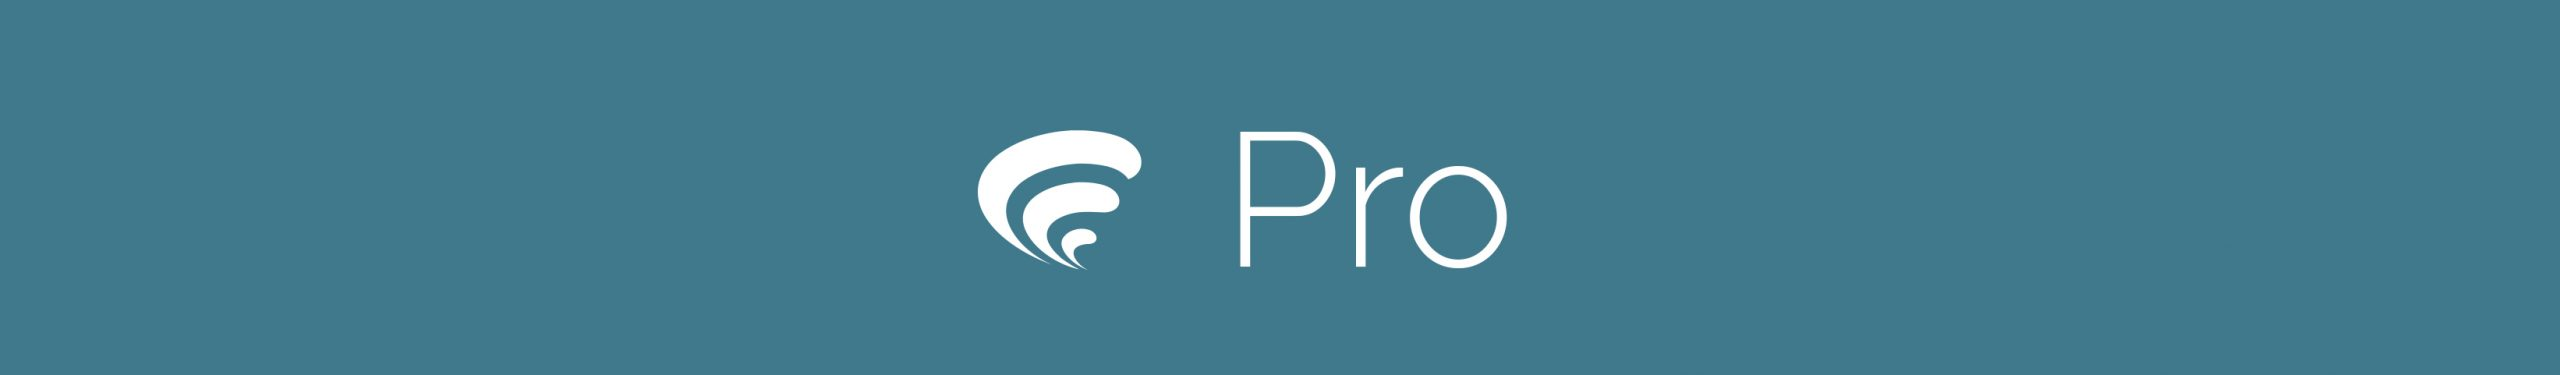 Produktbilde for Pindena Pro lisens